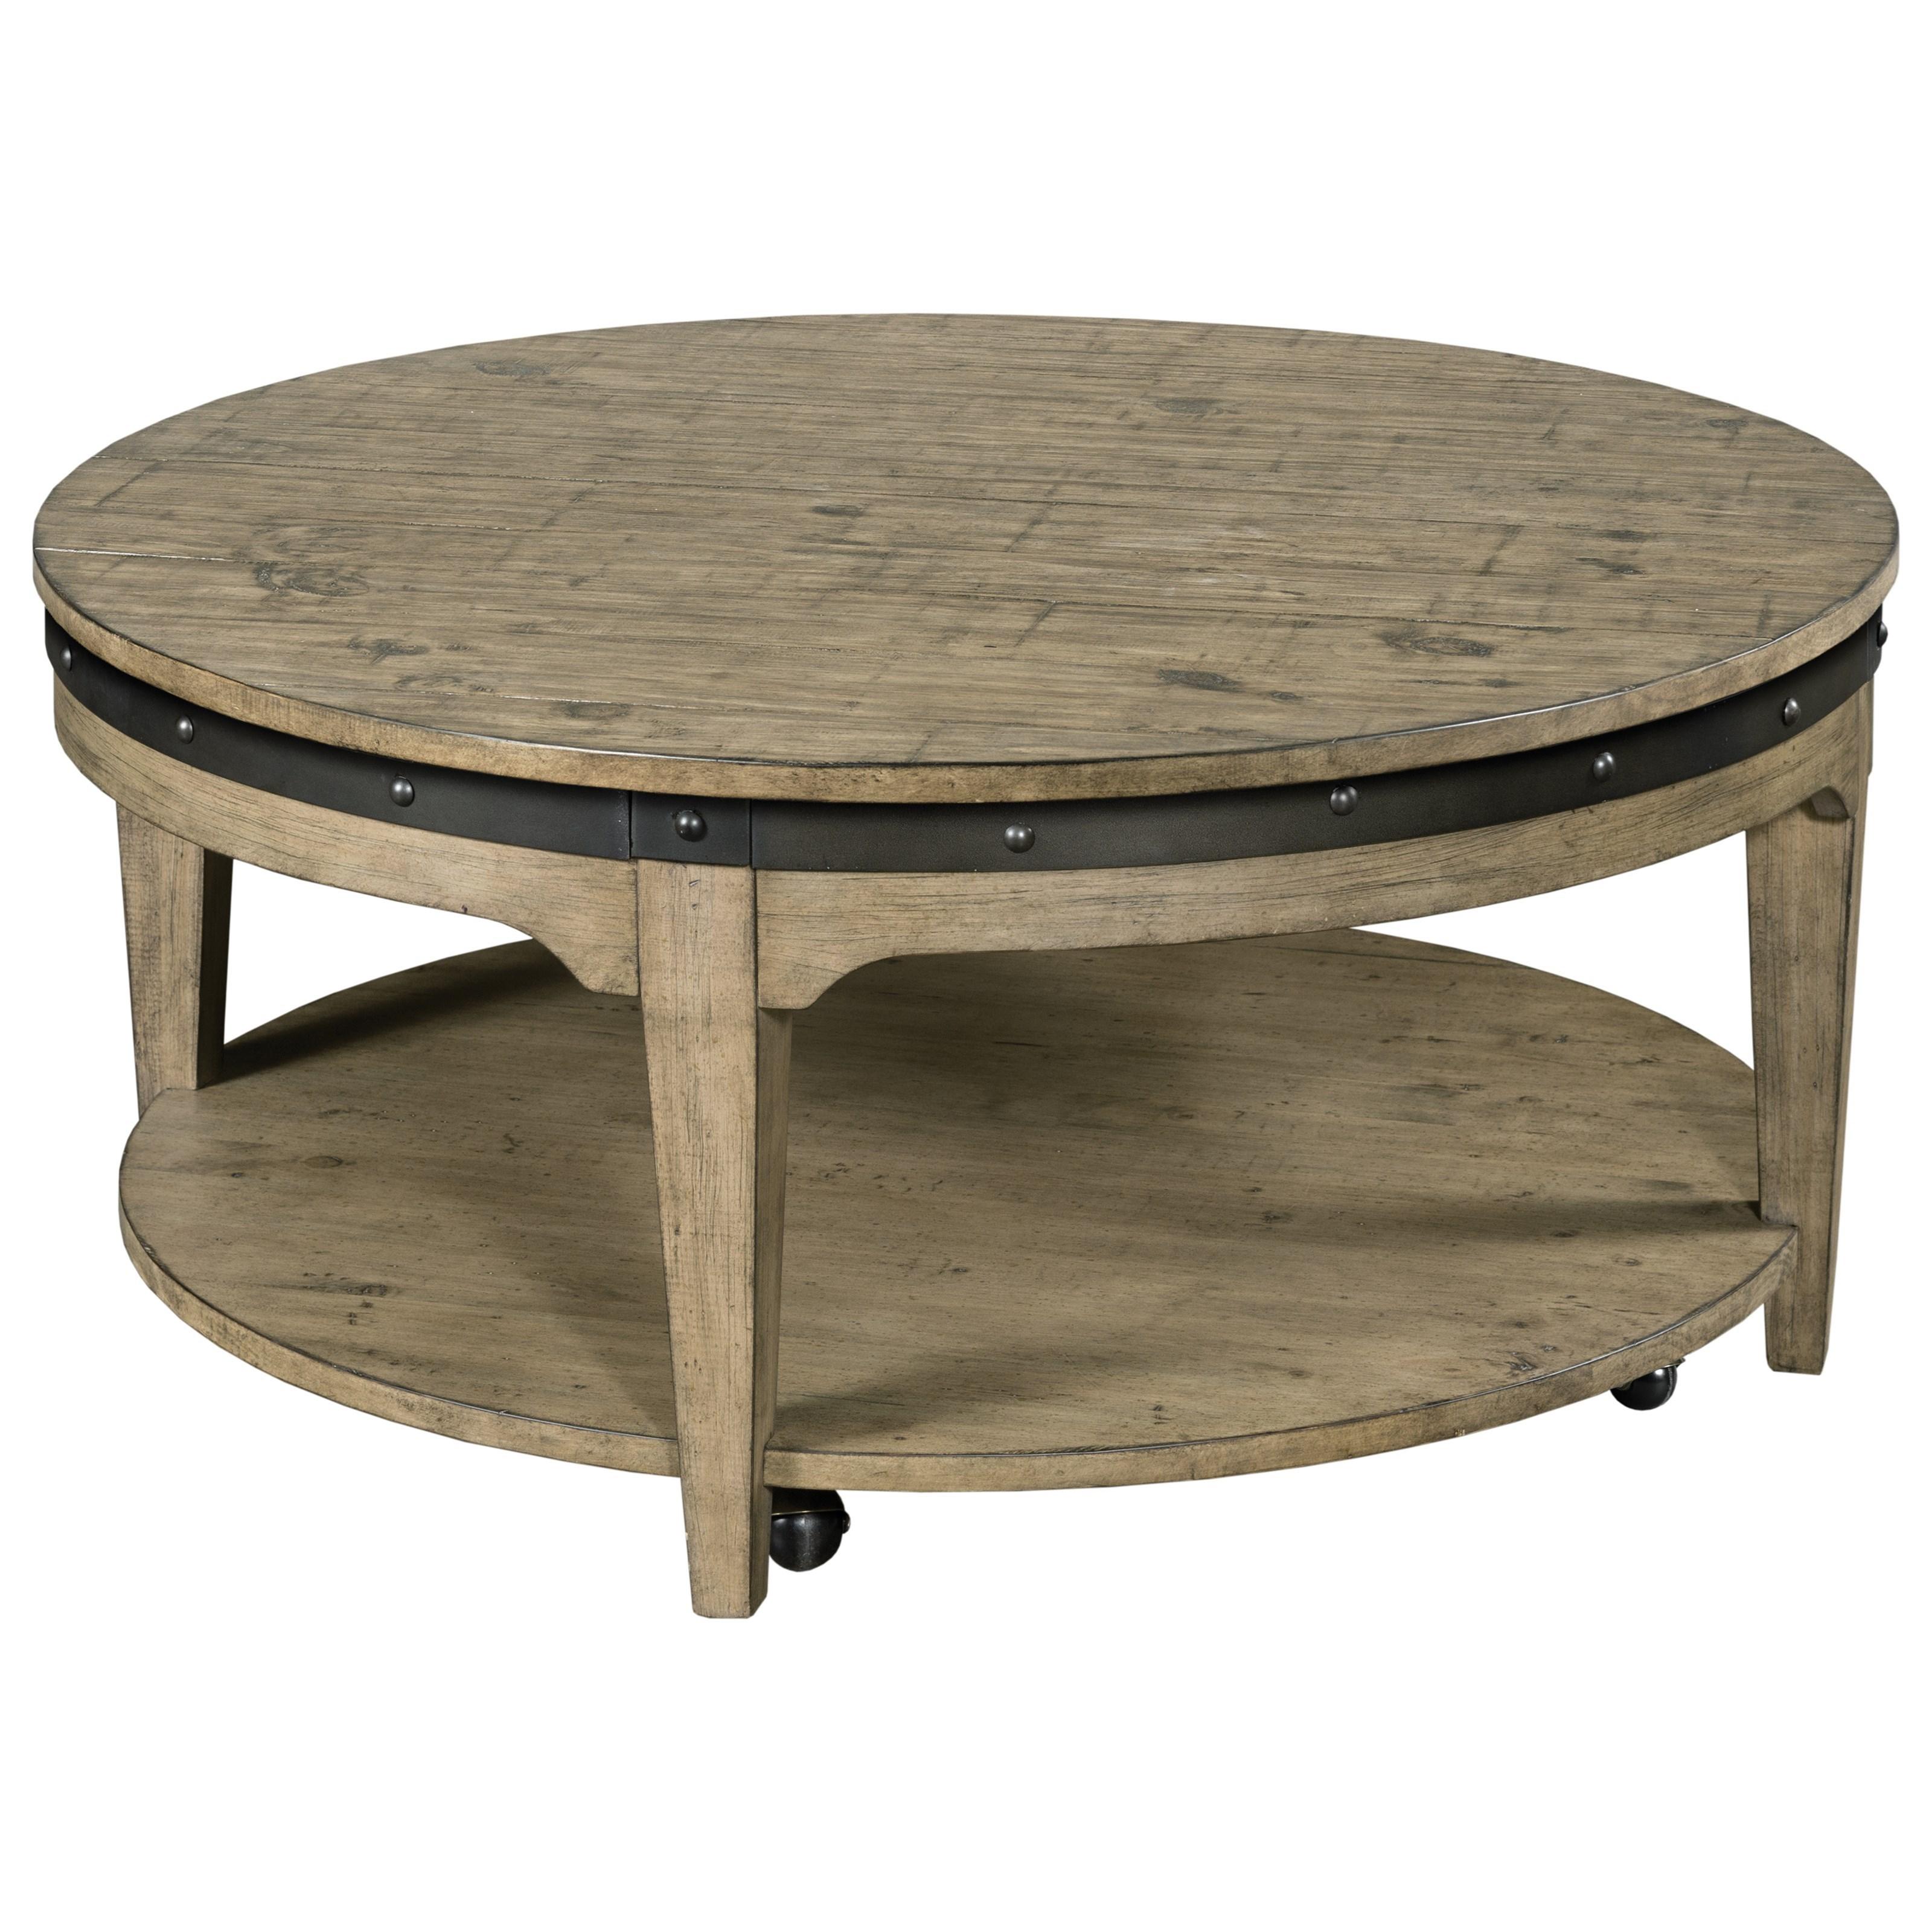 Artisans Round Cocktail Table